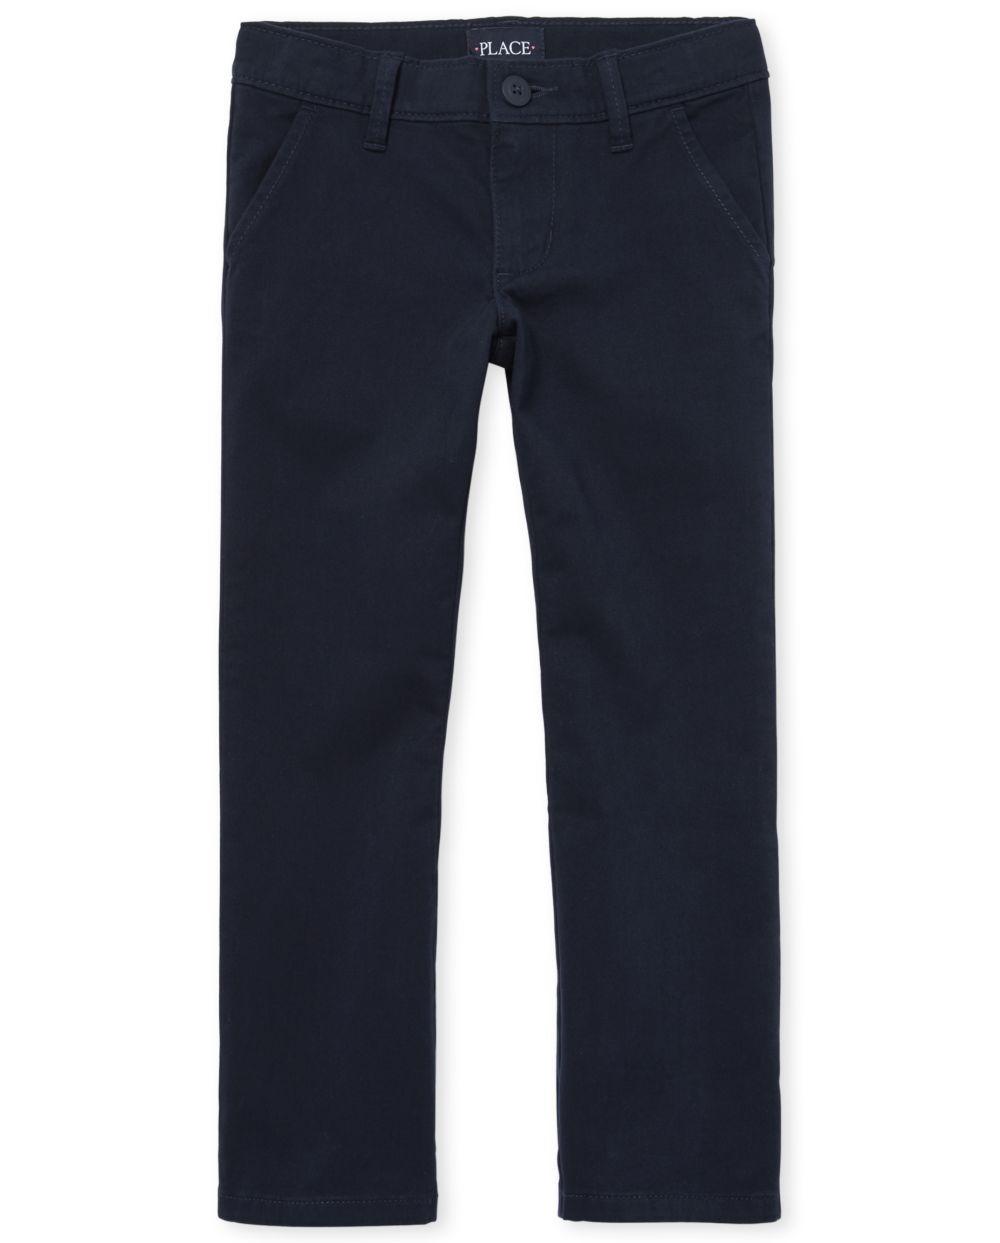 Coupons Girls Uniform Bootcut Chino Pants